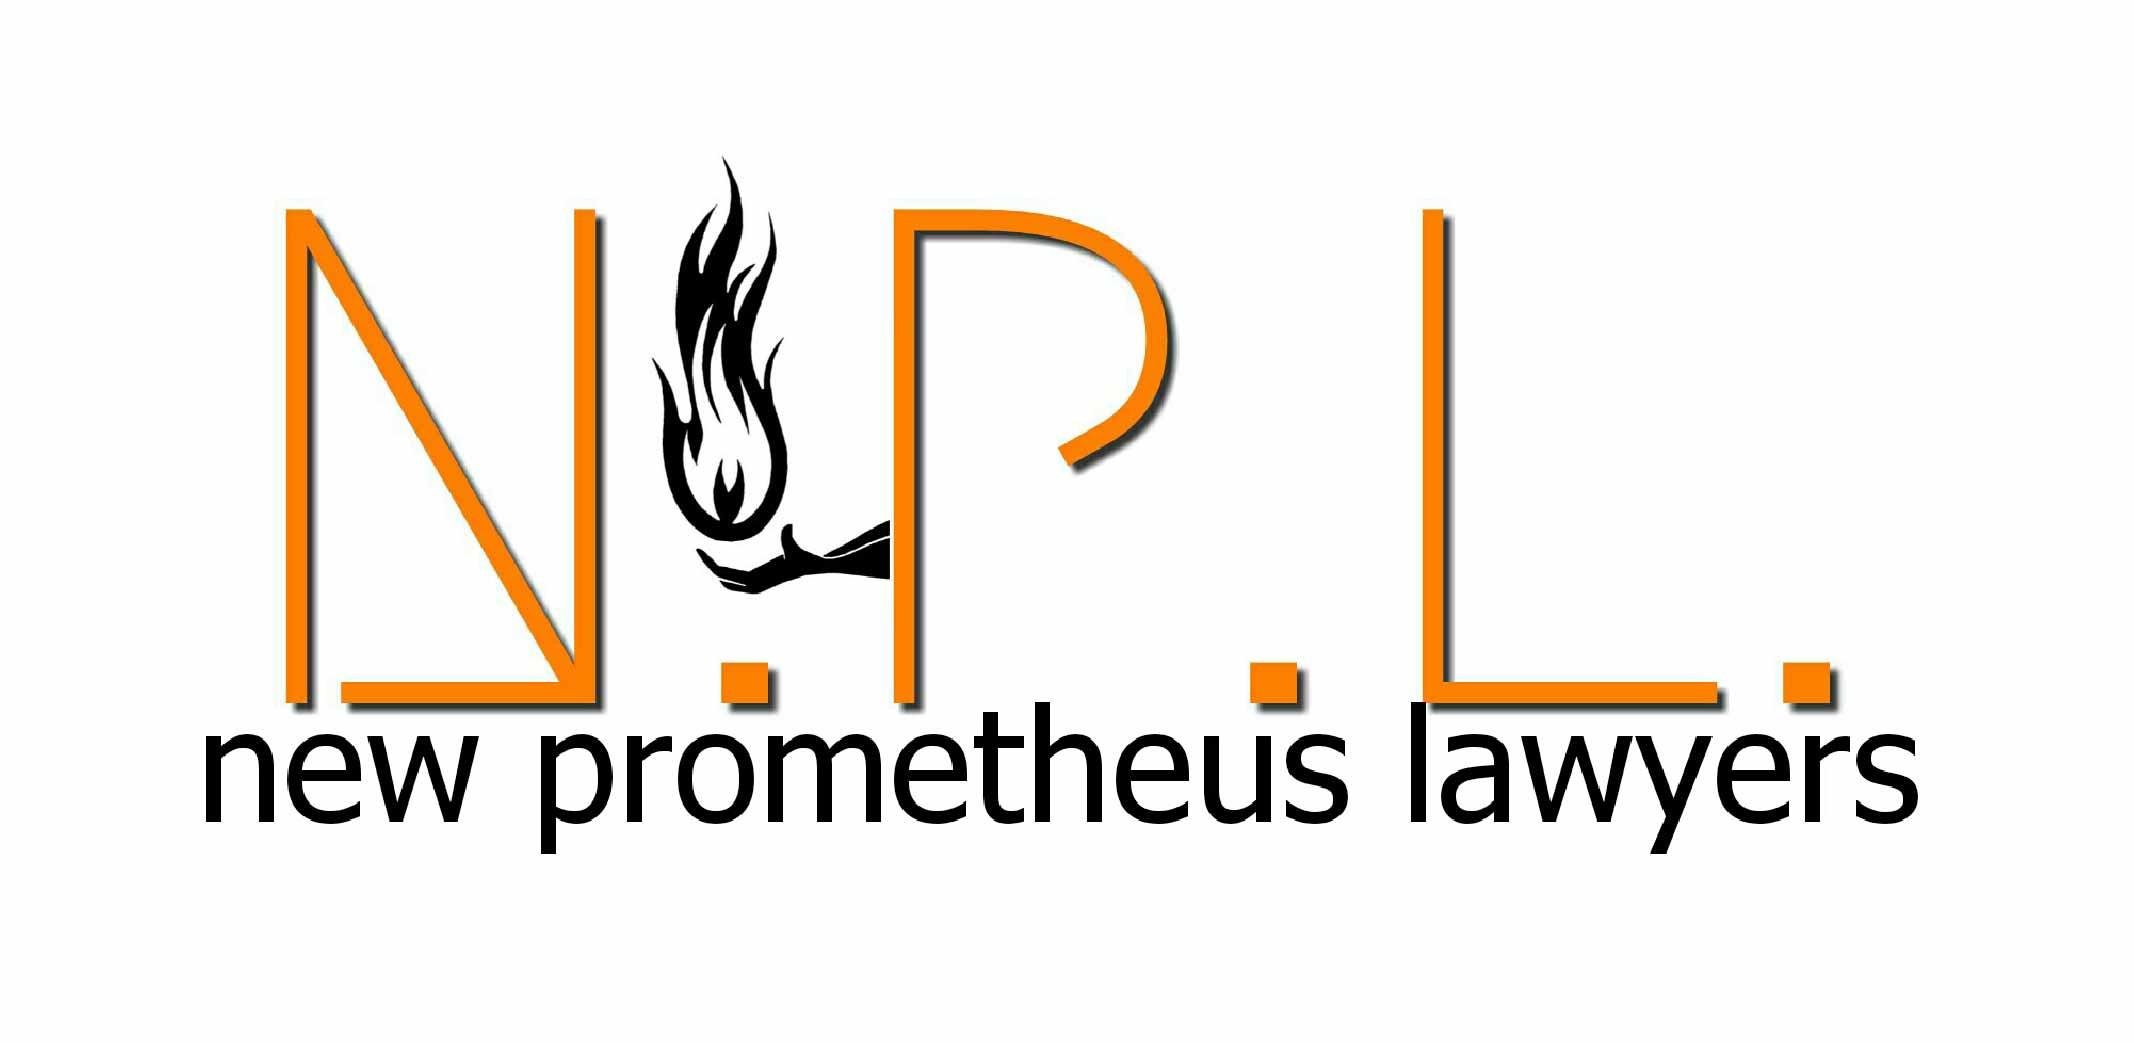 NPL- new prometheus lawyers_NPL - new prometheus lawyers